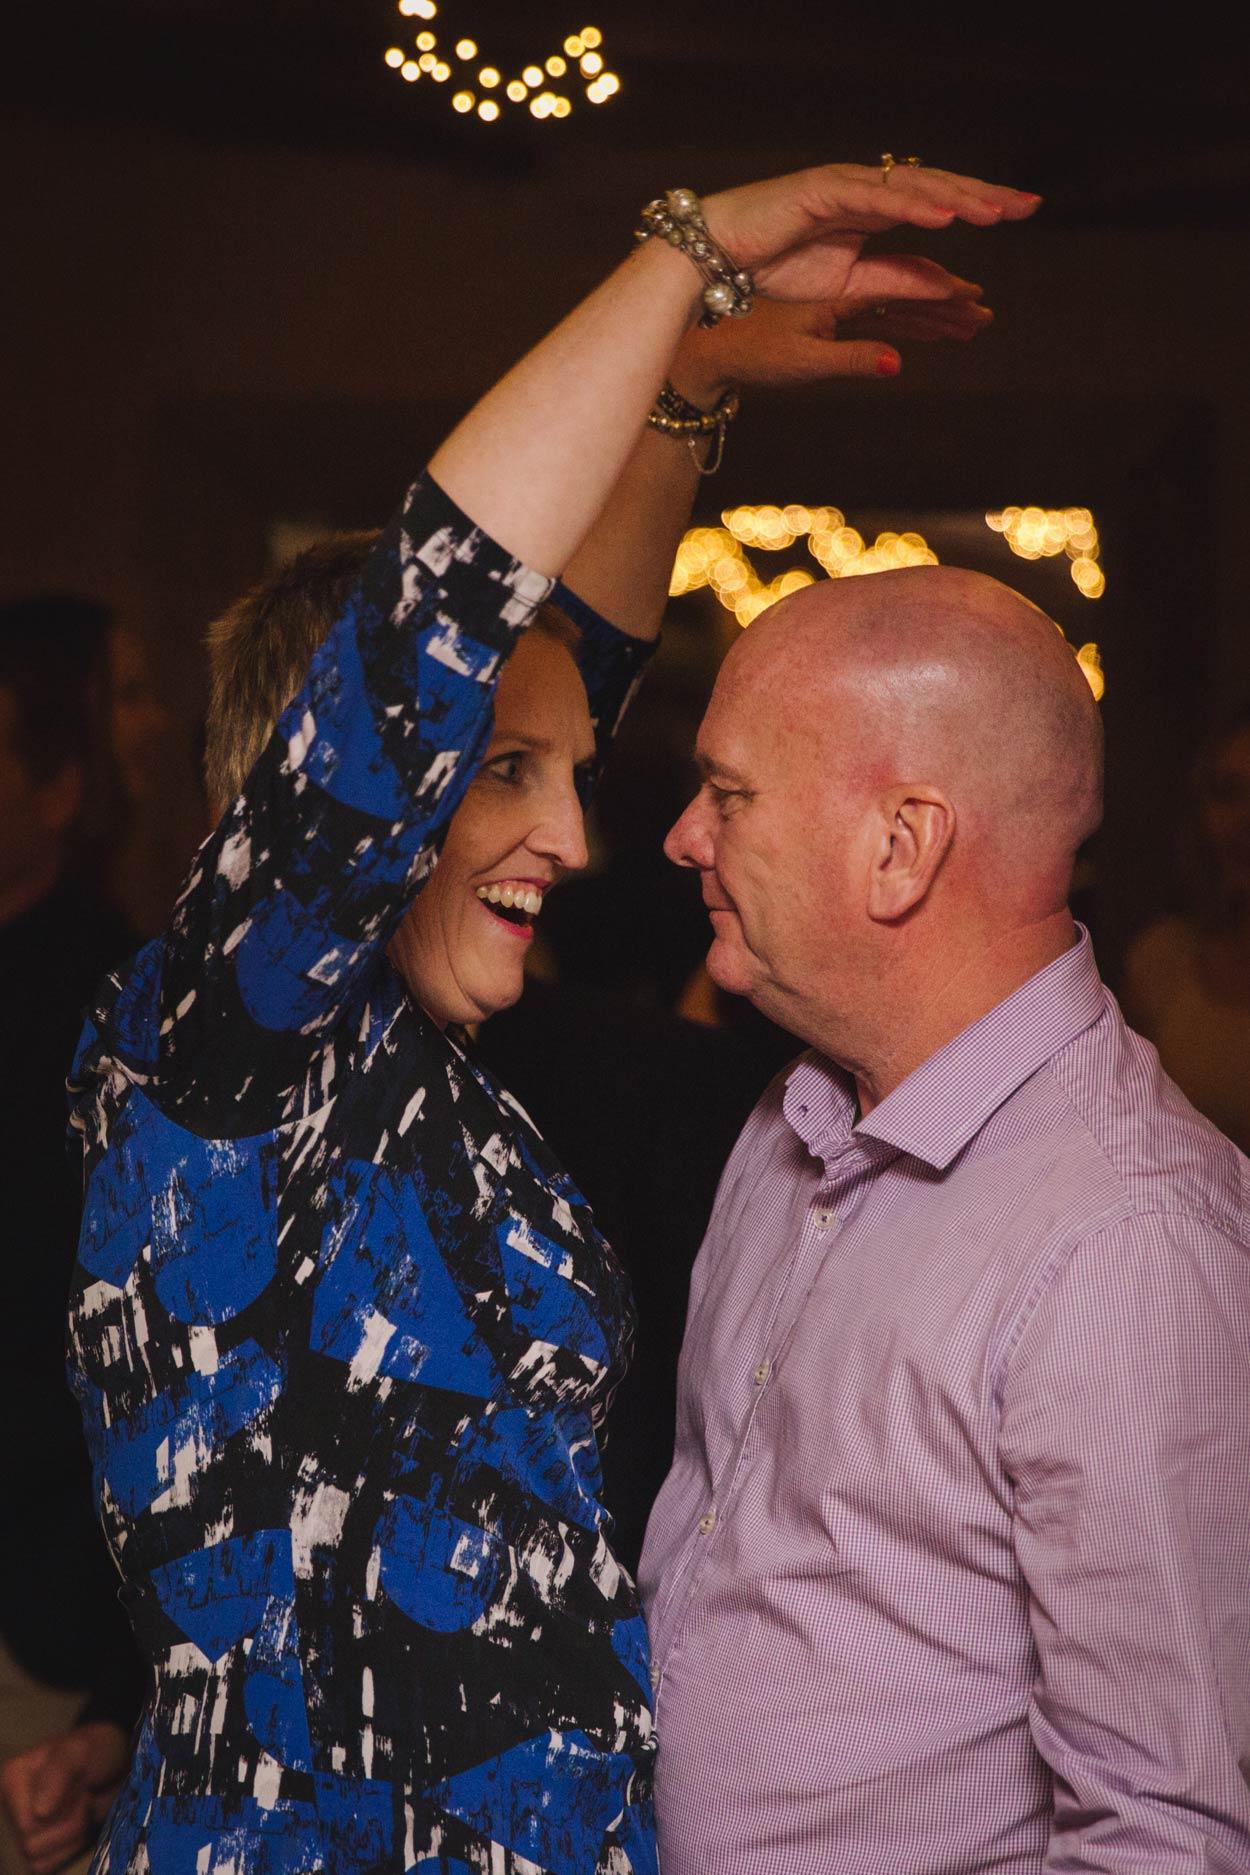 Top Mooloolaba, Queensland Brides Photographer Blog - Brisbane, Sunshine Coast, Australian Pre Wedding Destination